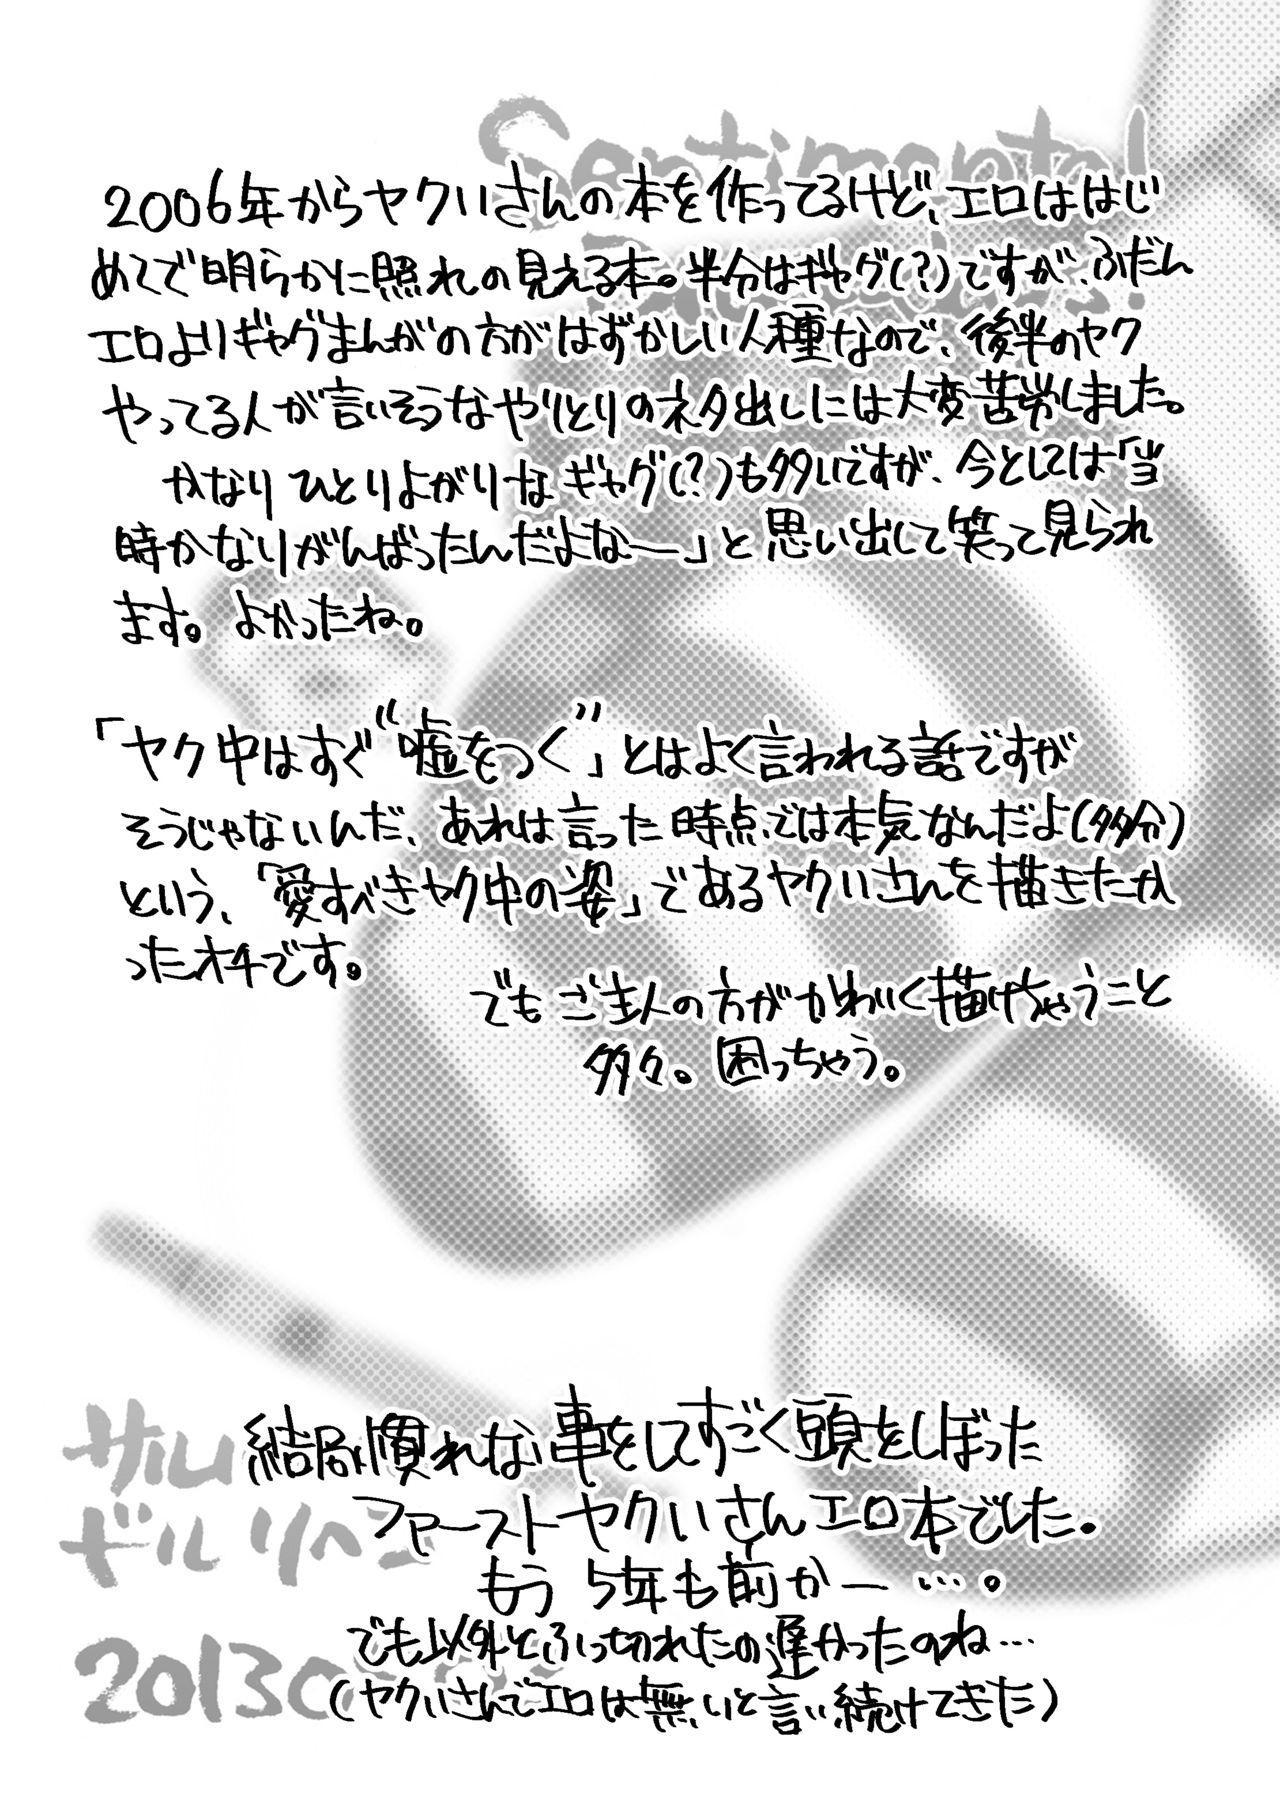 [Sarurururu (Doru Riheko)] Yakui-san Ero  Soushuuhen 2013-2016 (Nijiura Maids) [Digital] 18